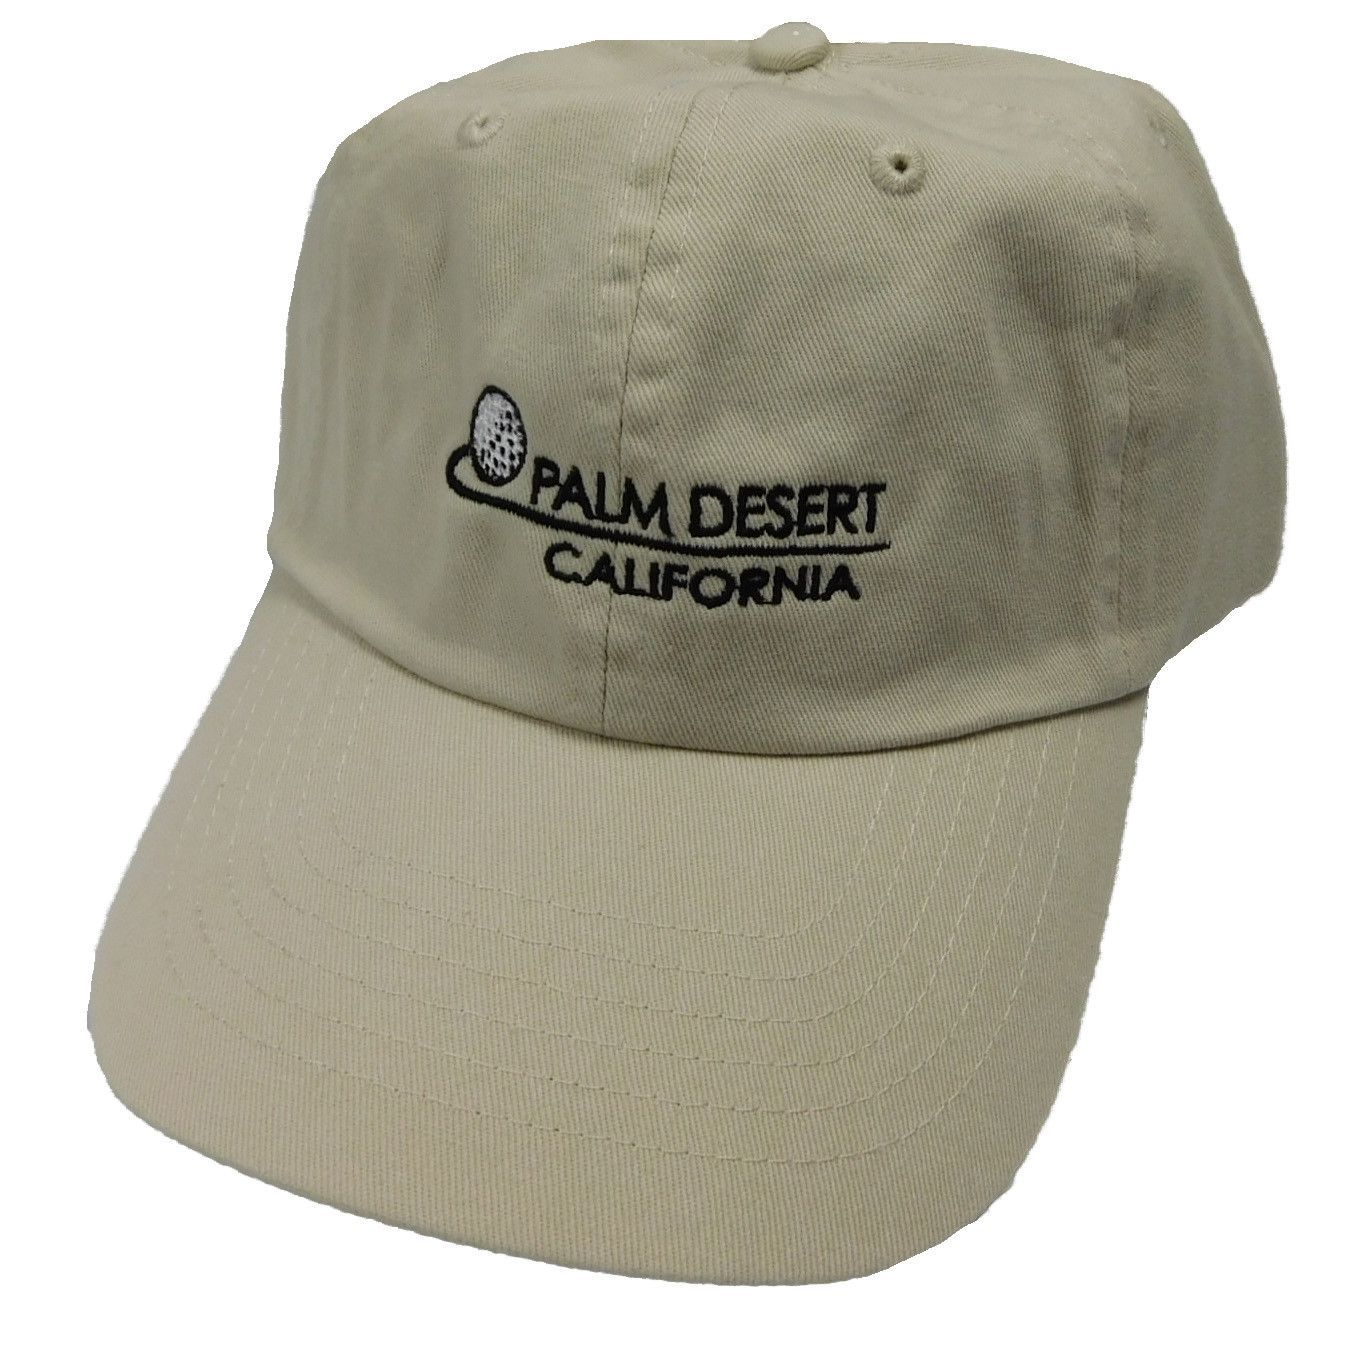 DPC Unstructured Twill Cap with PALM DESERT  bd4a69fe6ec0